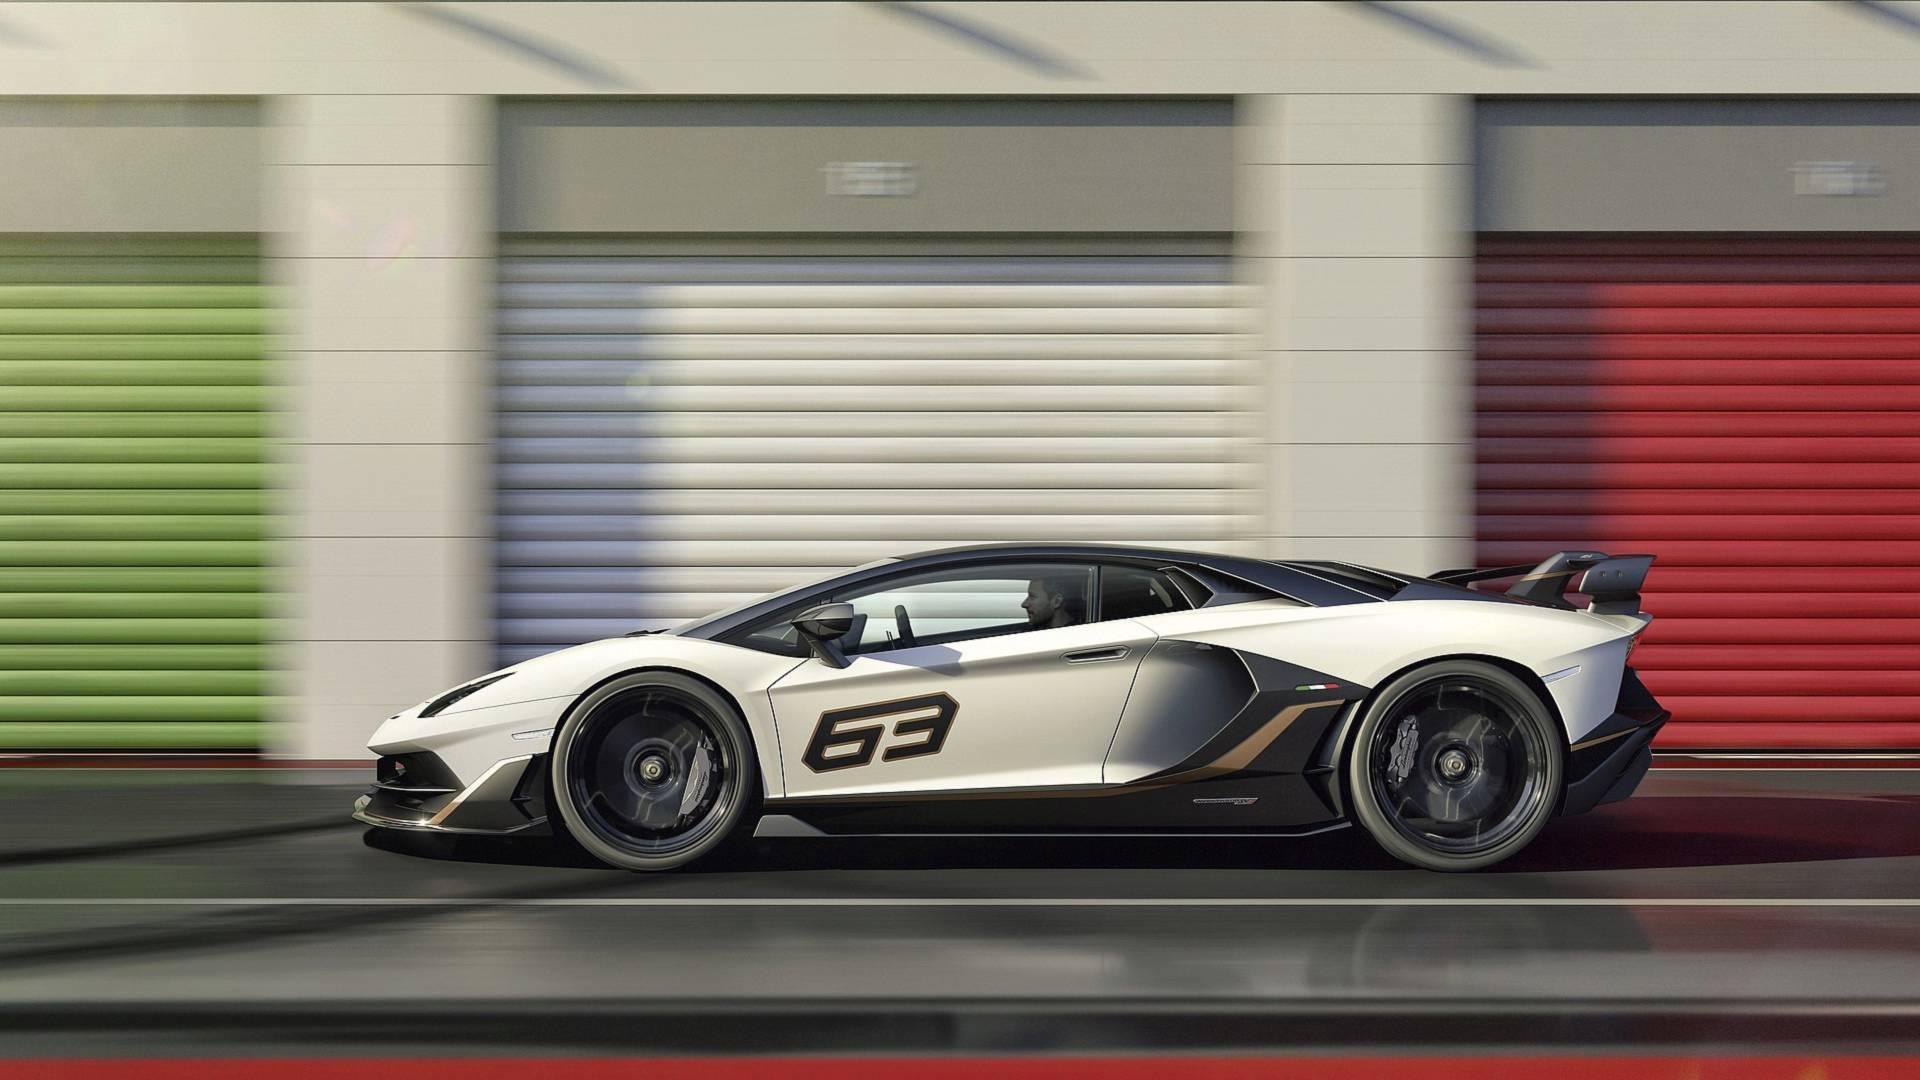 New Lamborghini Model Confirmed, Aventador SVJ Roadster